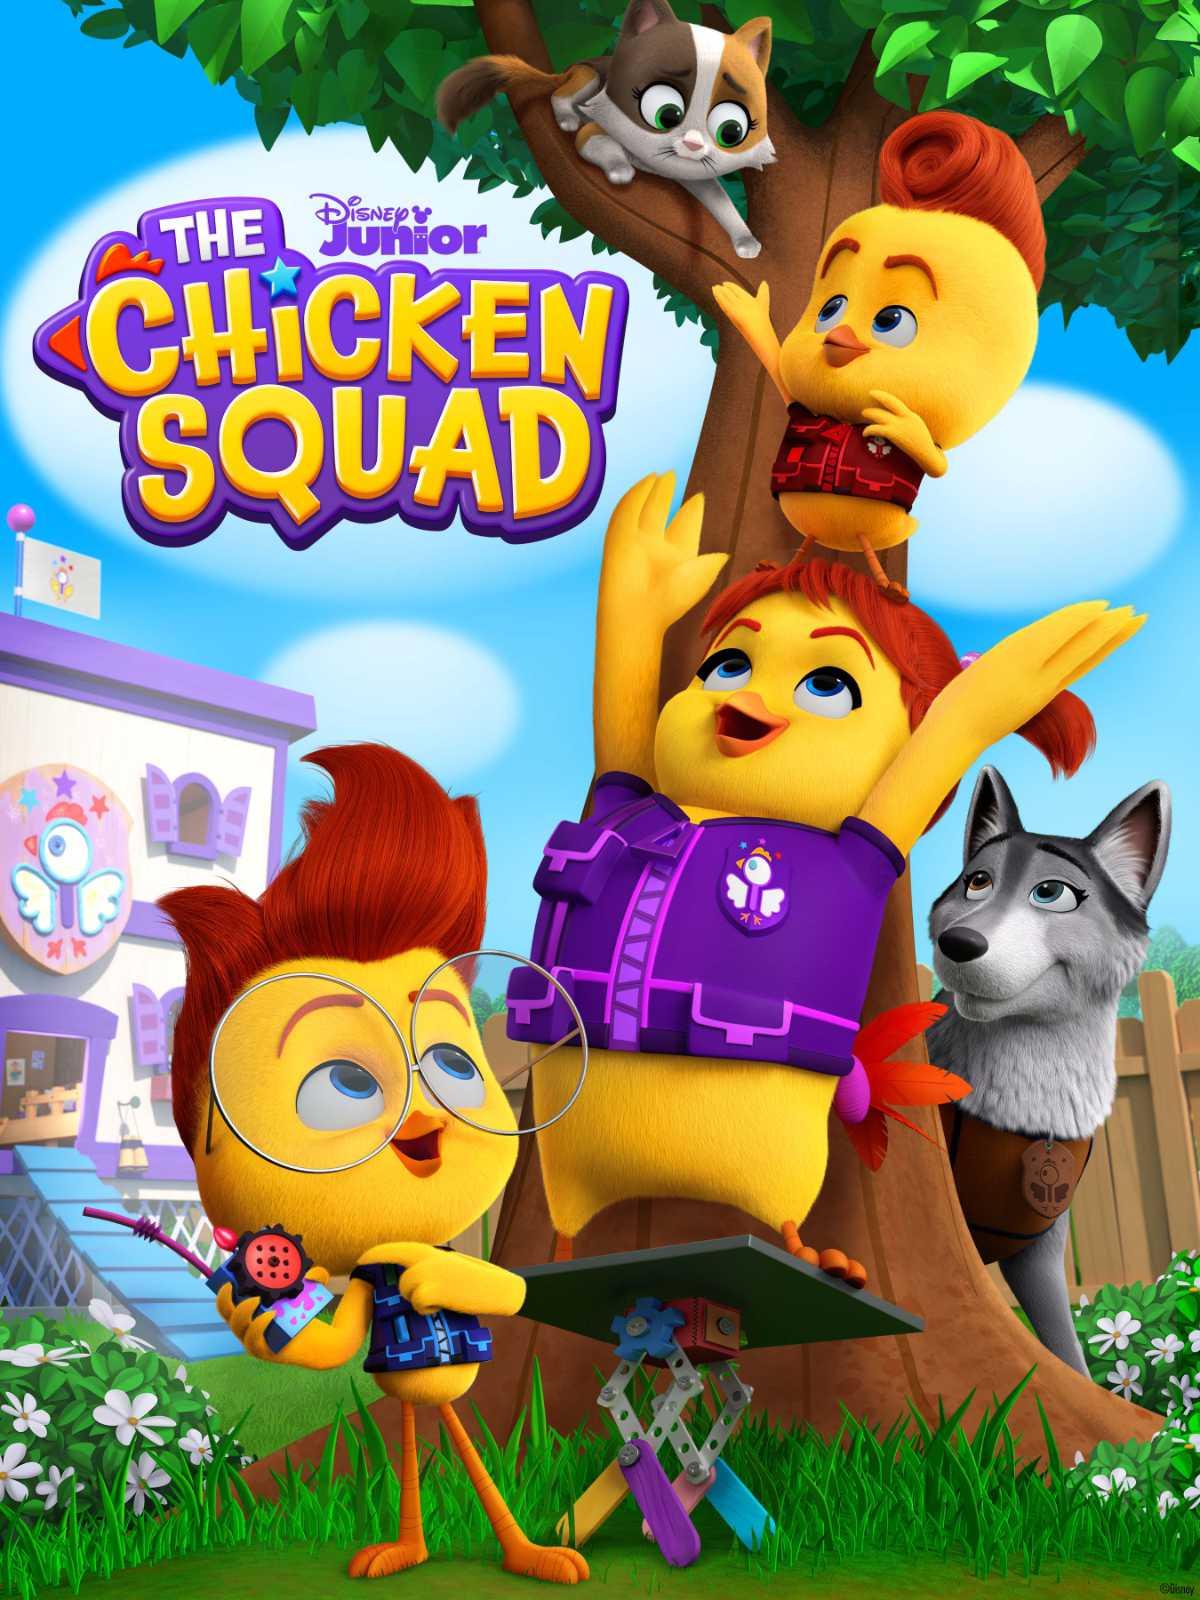 Disney Channels June 2021 Programming Announced